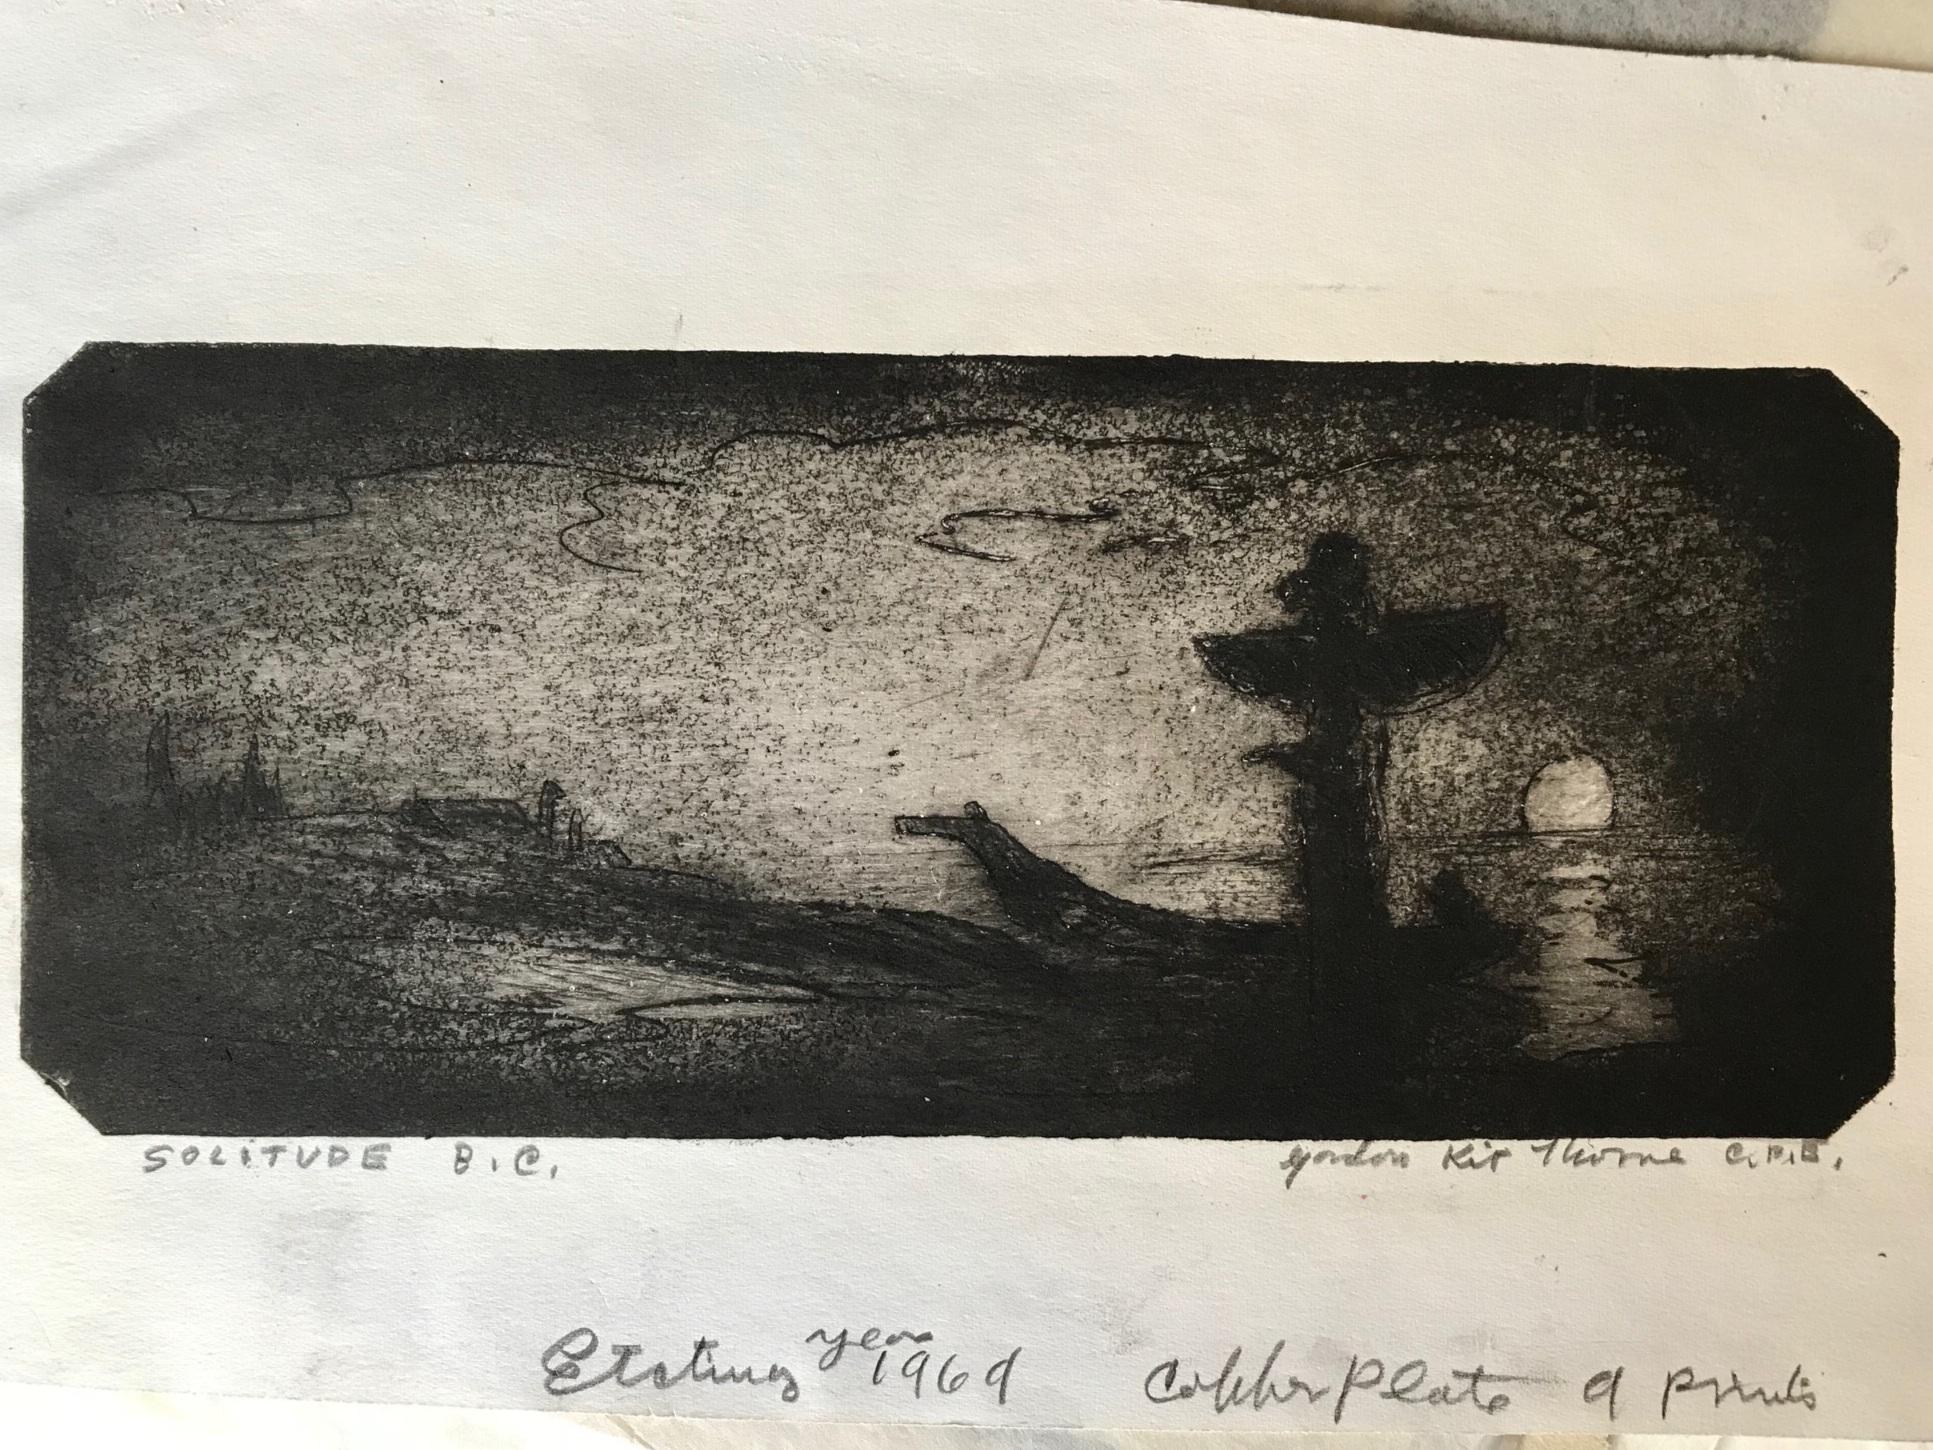 Gordon Kit Thorne, Solitude B.C.